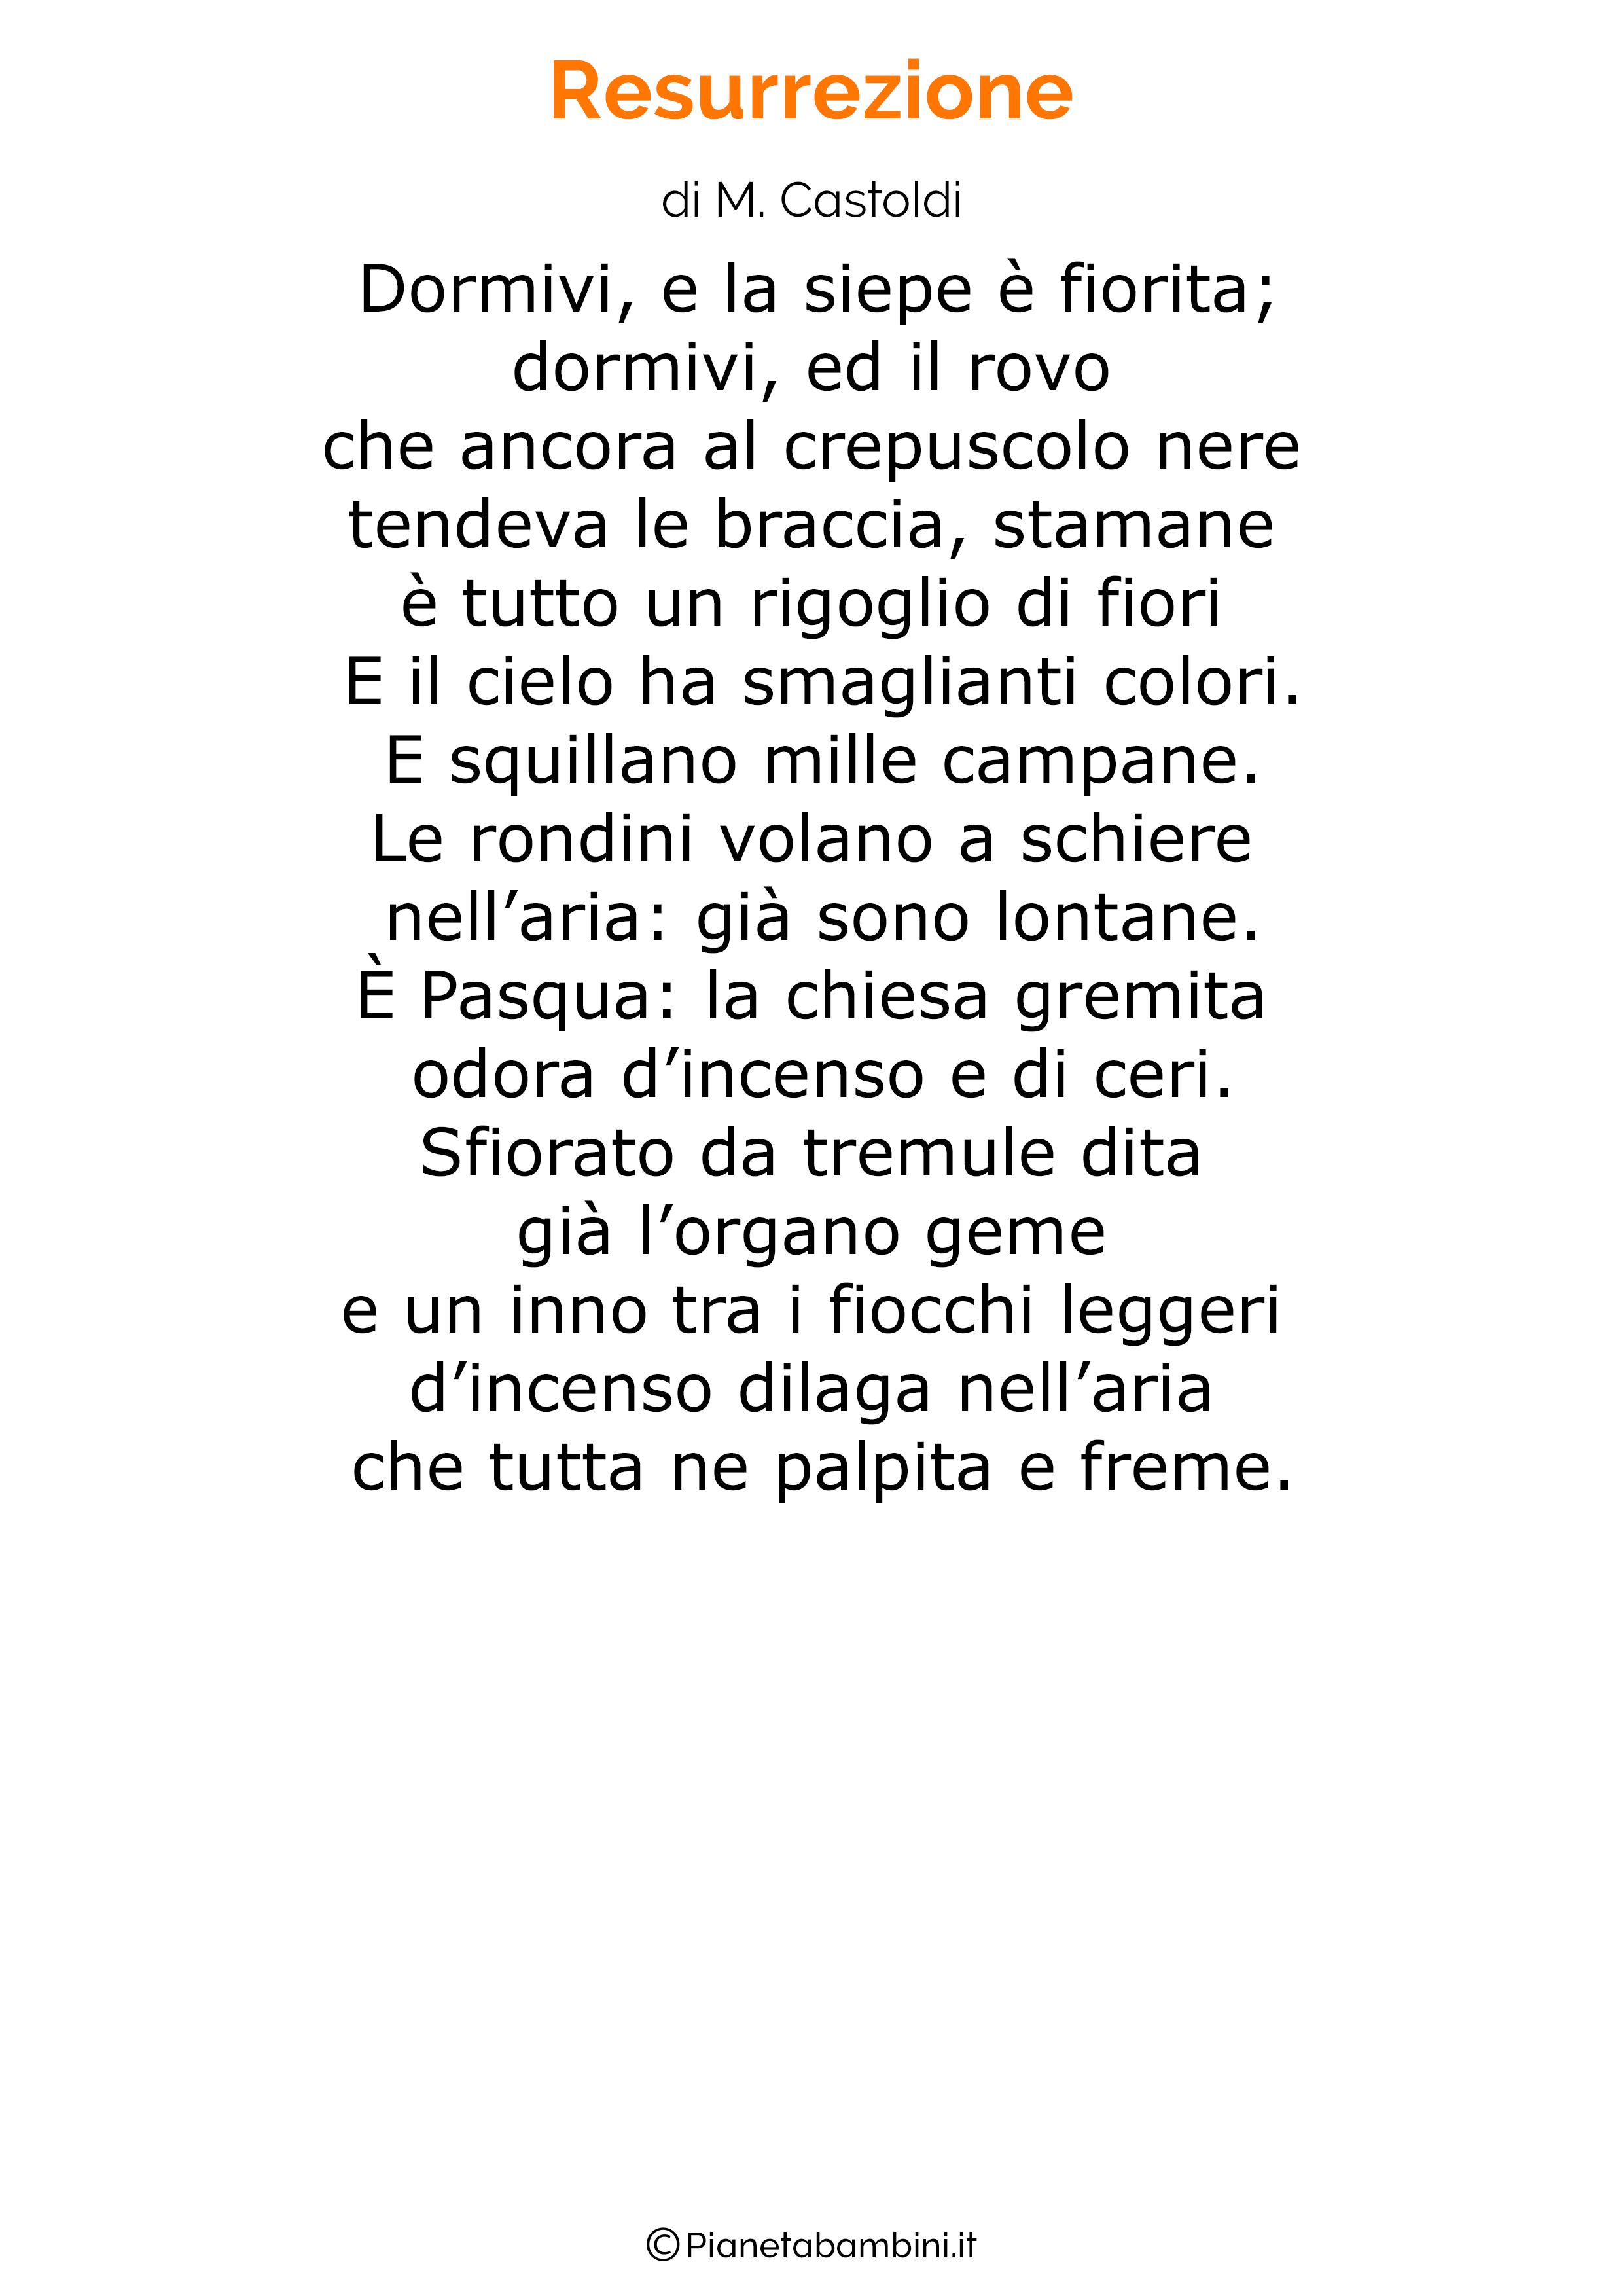 Poesia di Pasqua 38